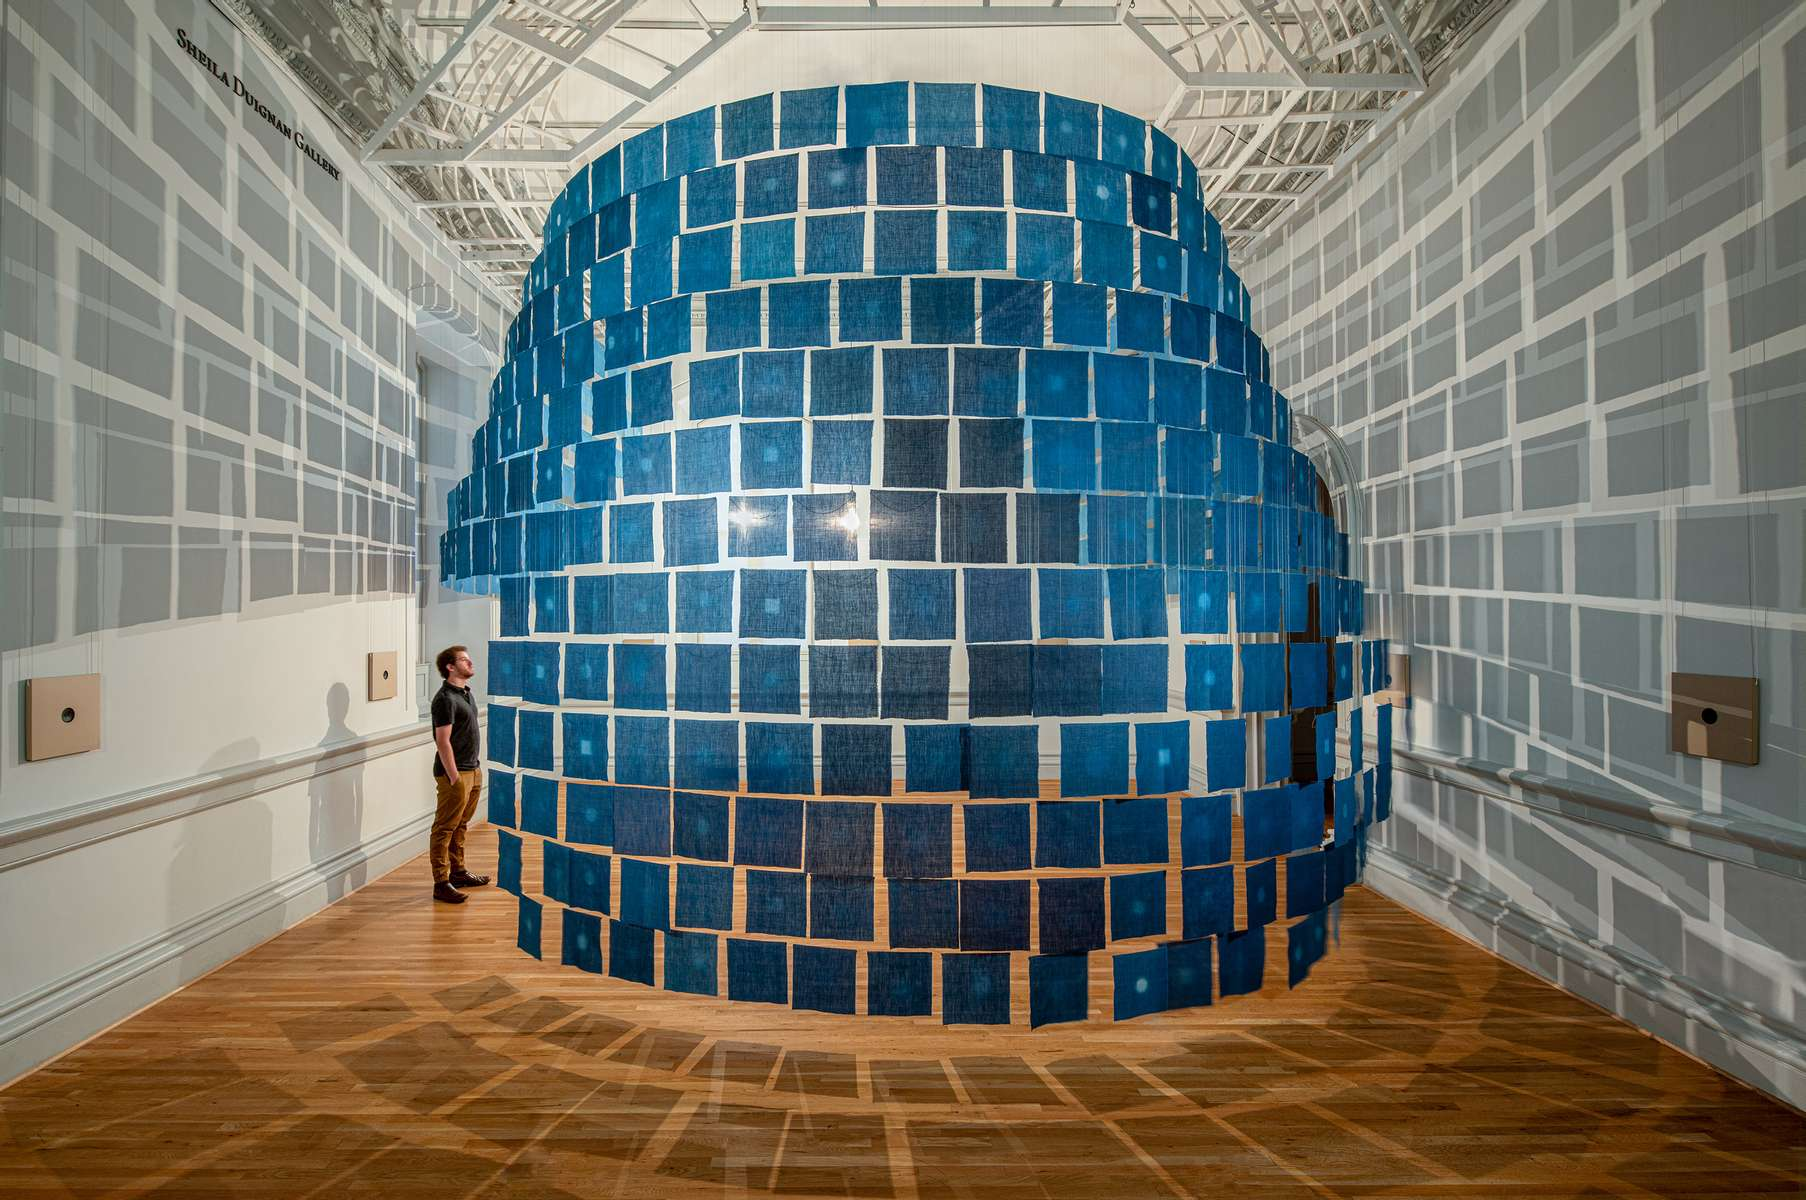 Rowland RickettsAi no Keshiki – Indigo Views{quote}Forces of Nature{quote} Renwick Biennial Invitational 2021Smithsonian / Renwick Gallery